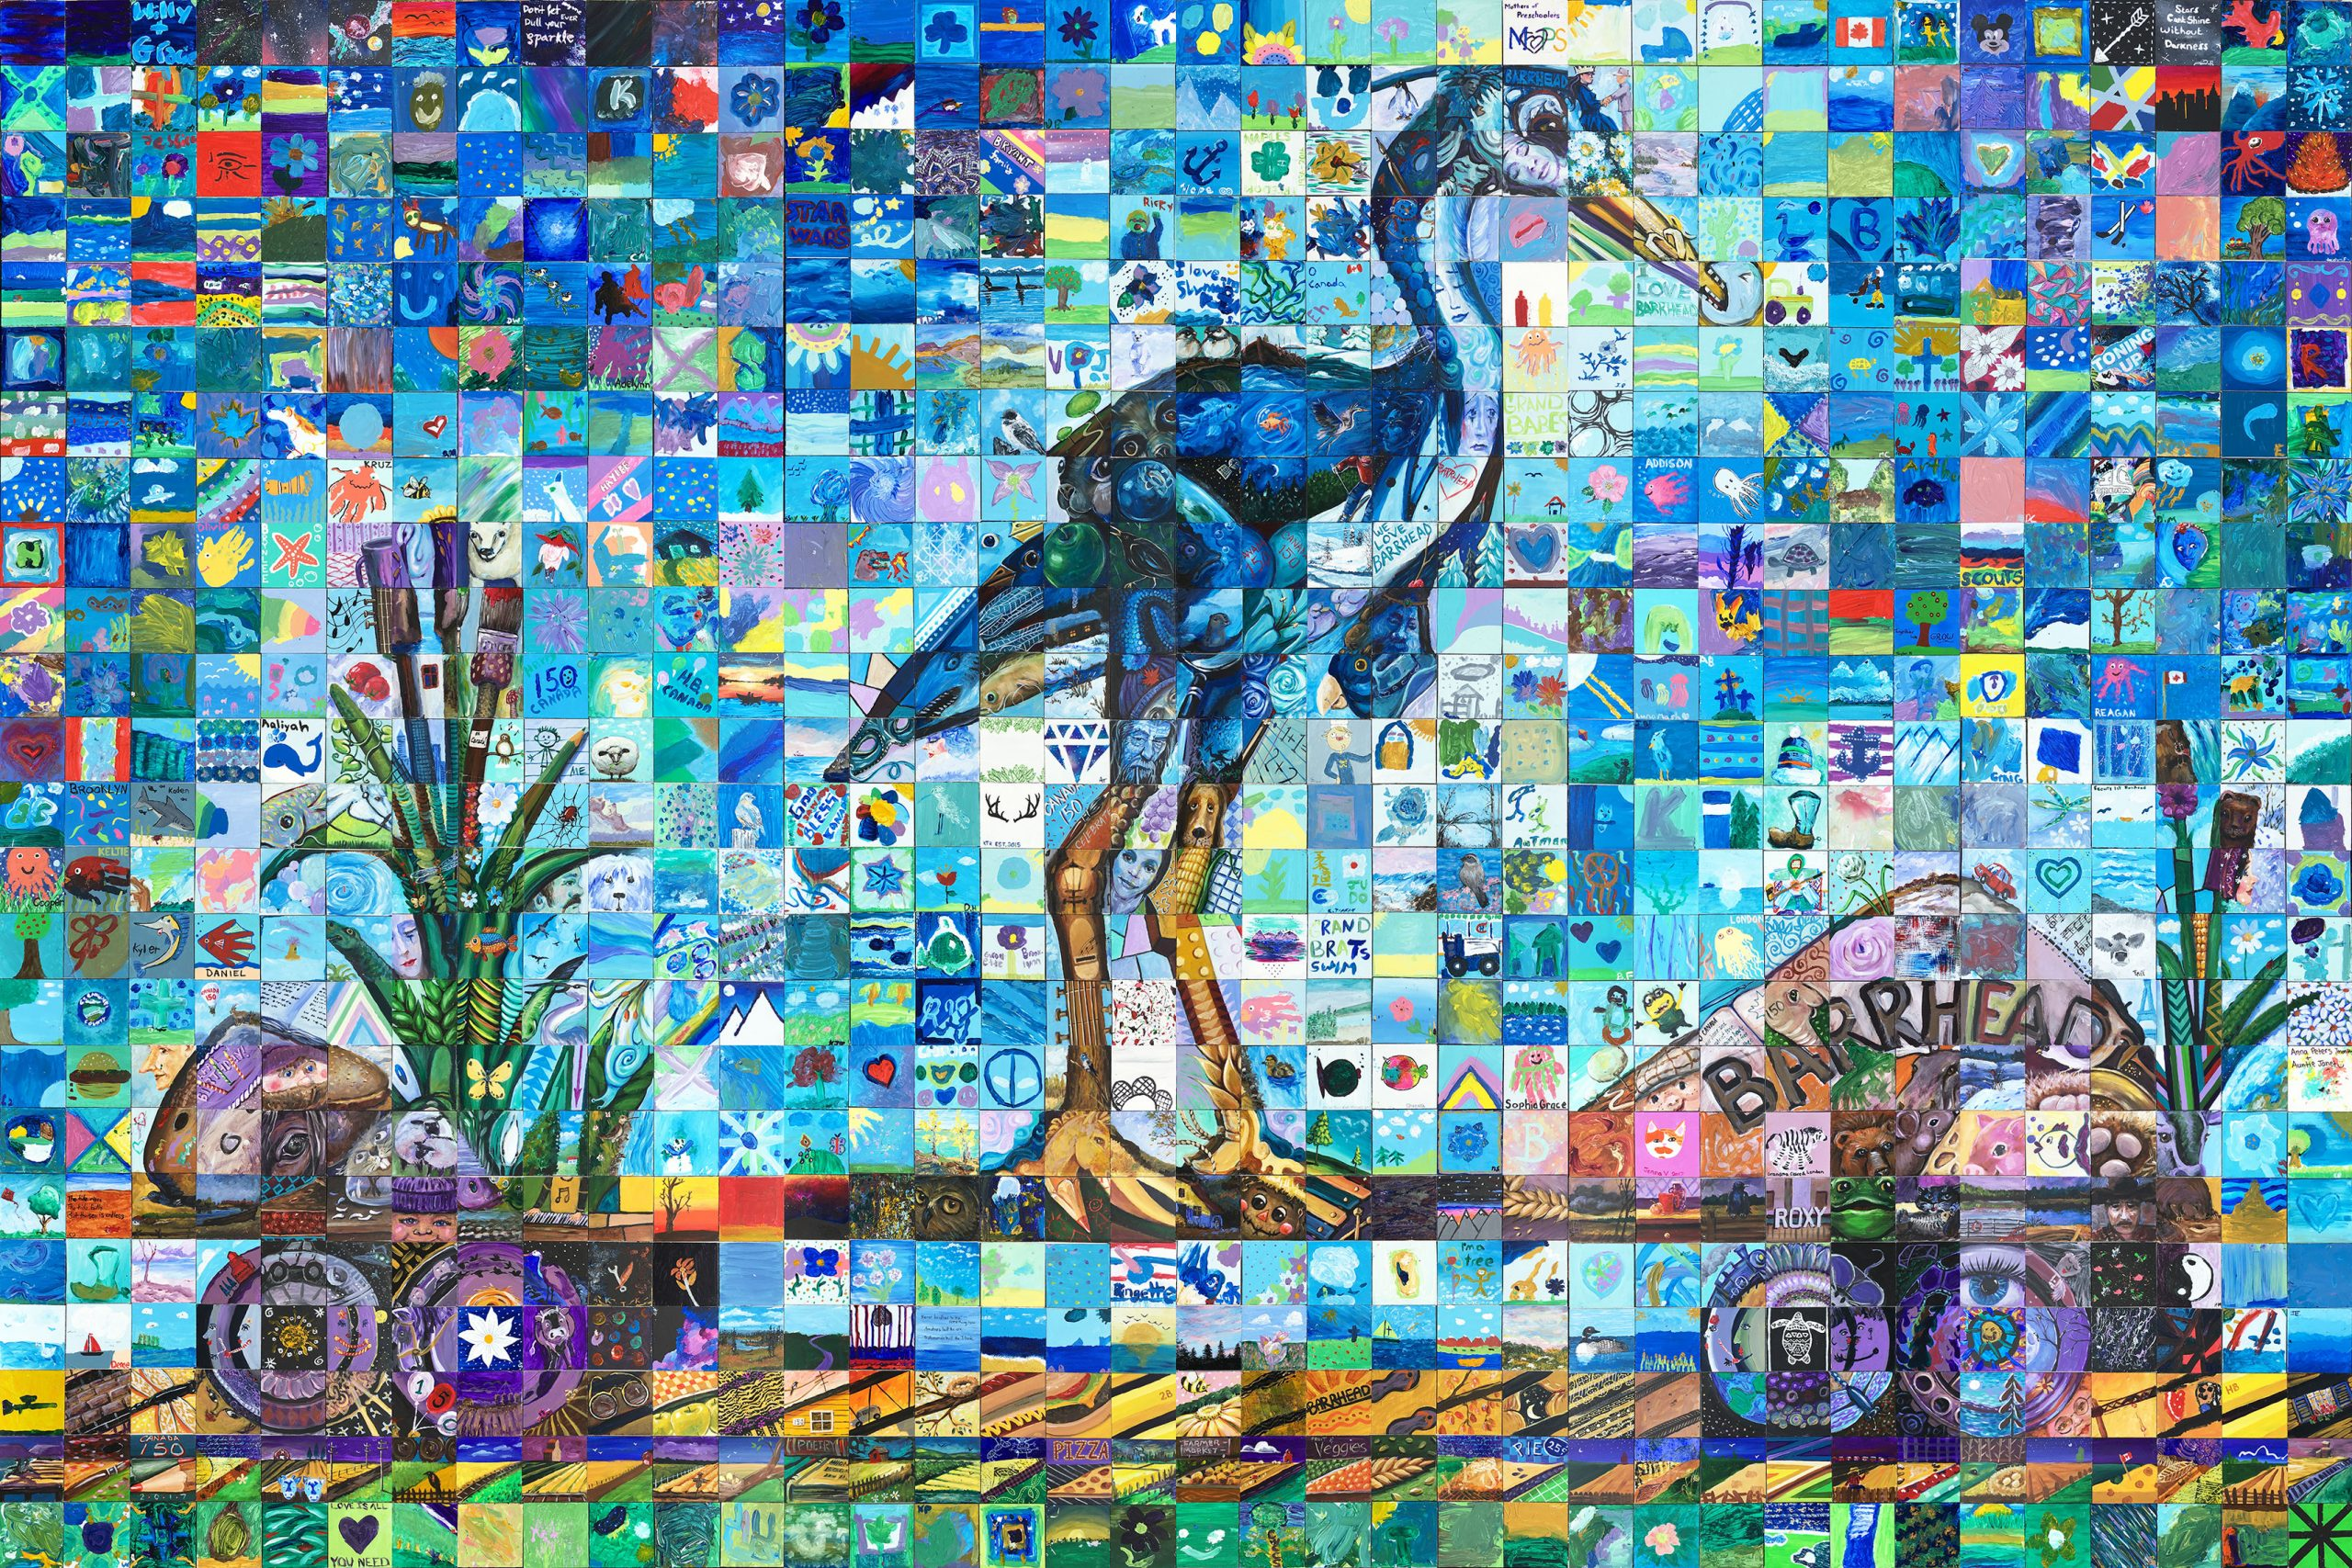 Barrhead Alberta Canada 150 mural